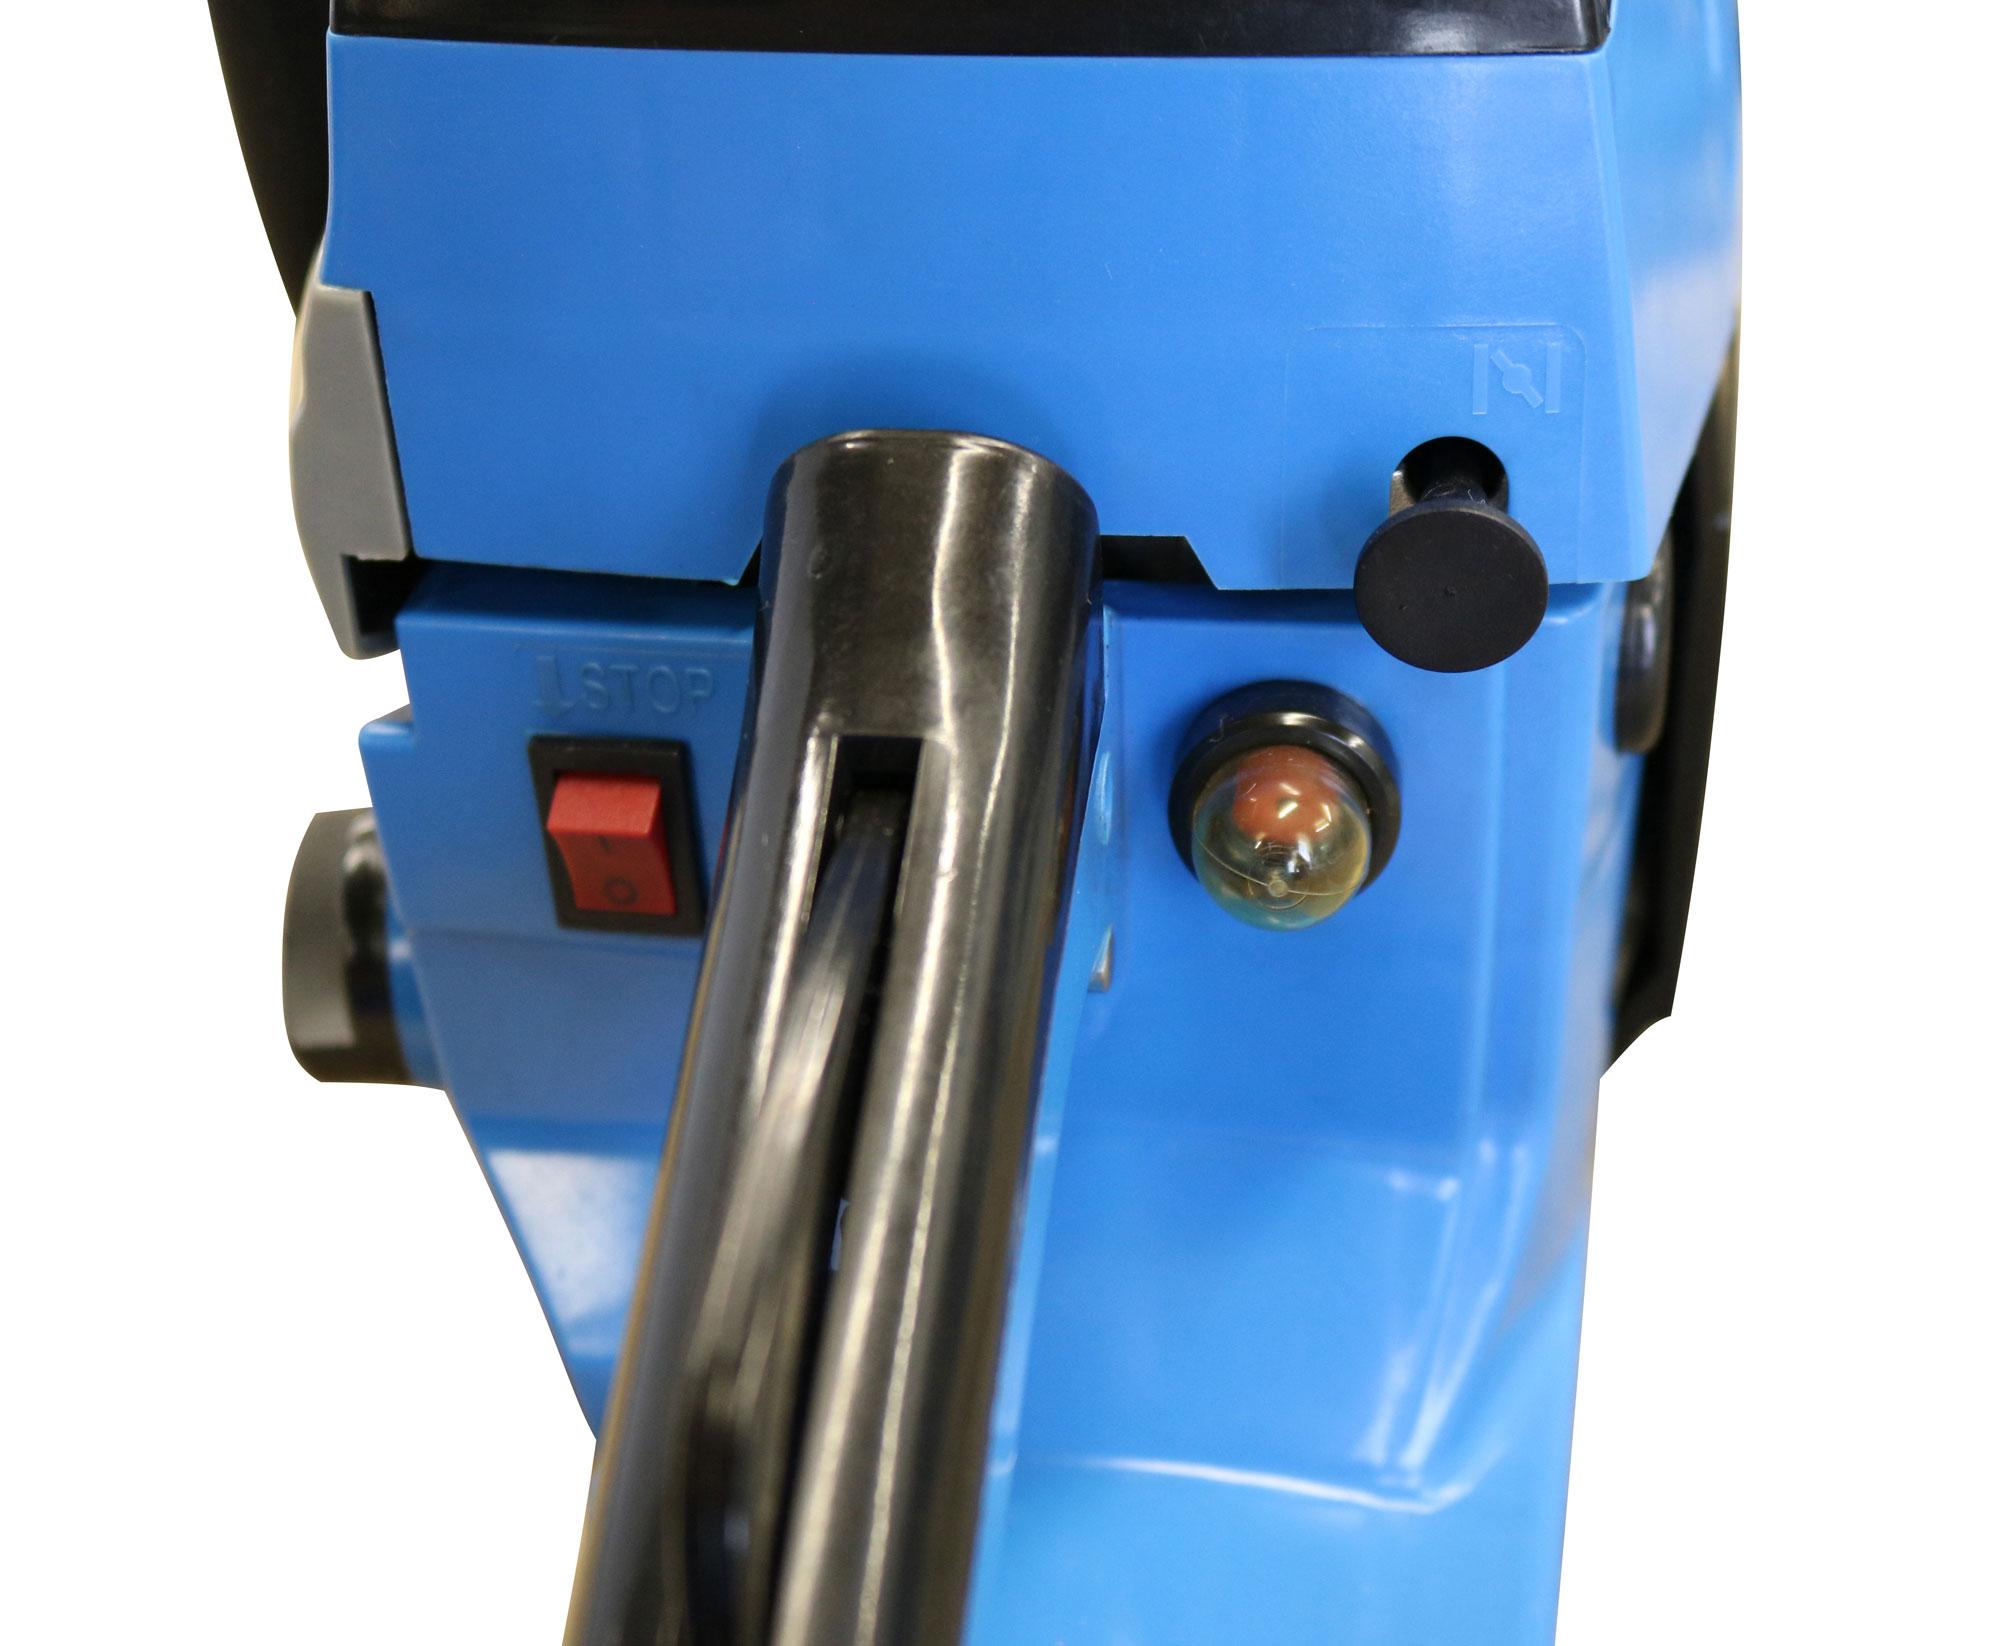 Benzin Motorsäge / Motorkettensäge KS 400-41 Güde Schwertlänge 46cm Bild 3